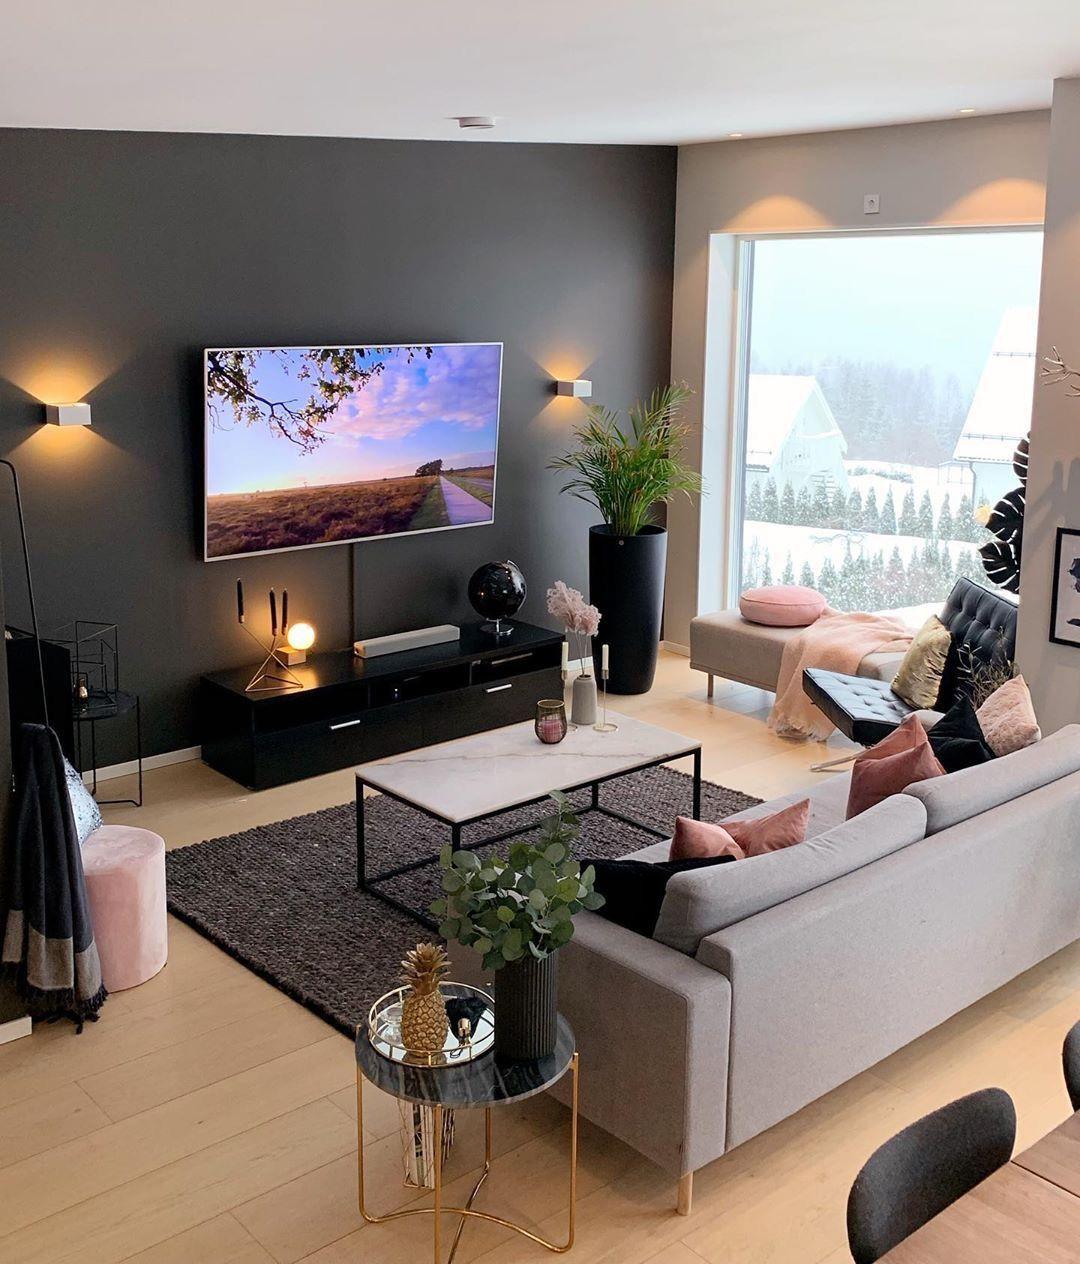 Pin By Rida R On Design Interior Modern Living Room Inspiration Living Room Decor Apartment Simple Living Room Decor